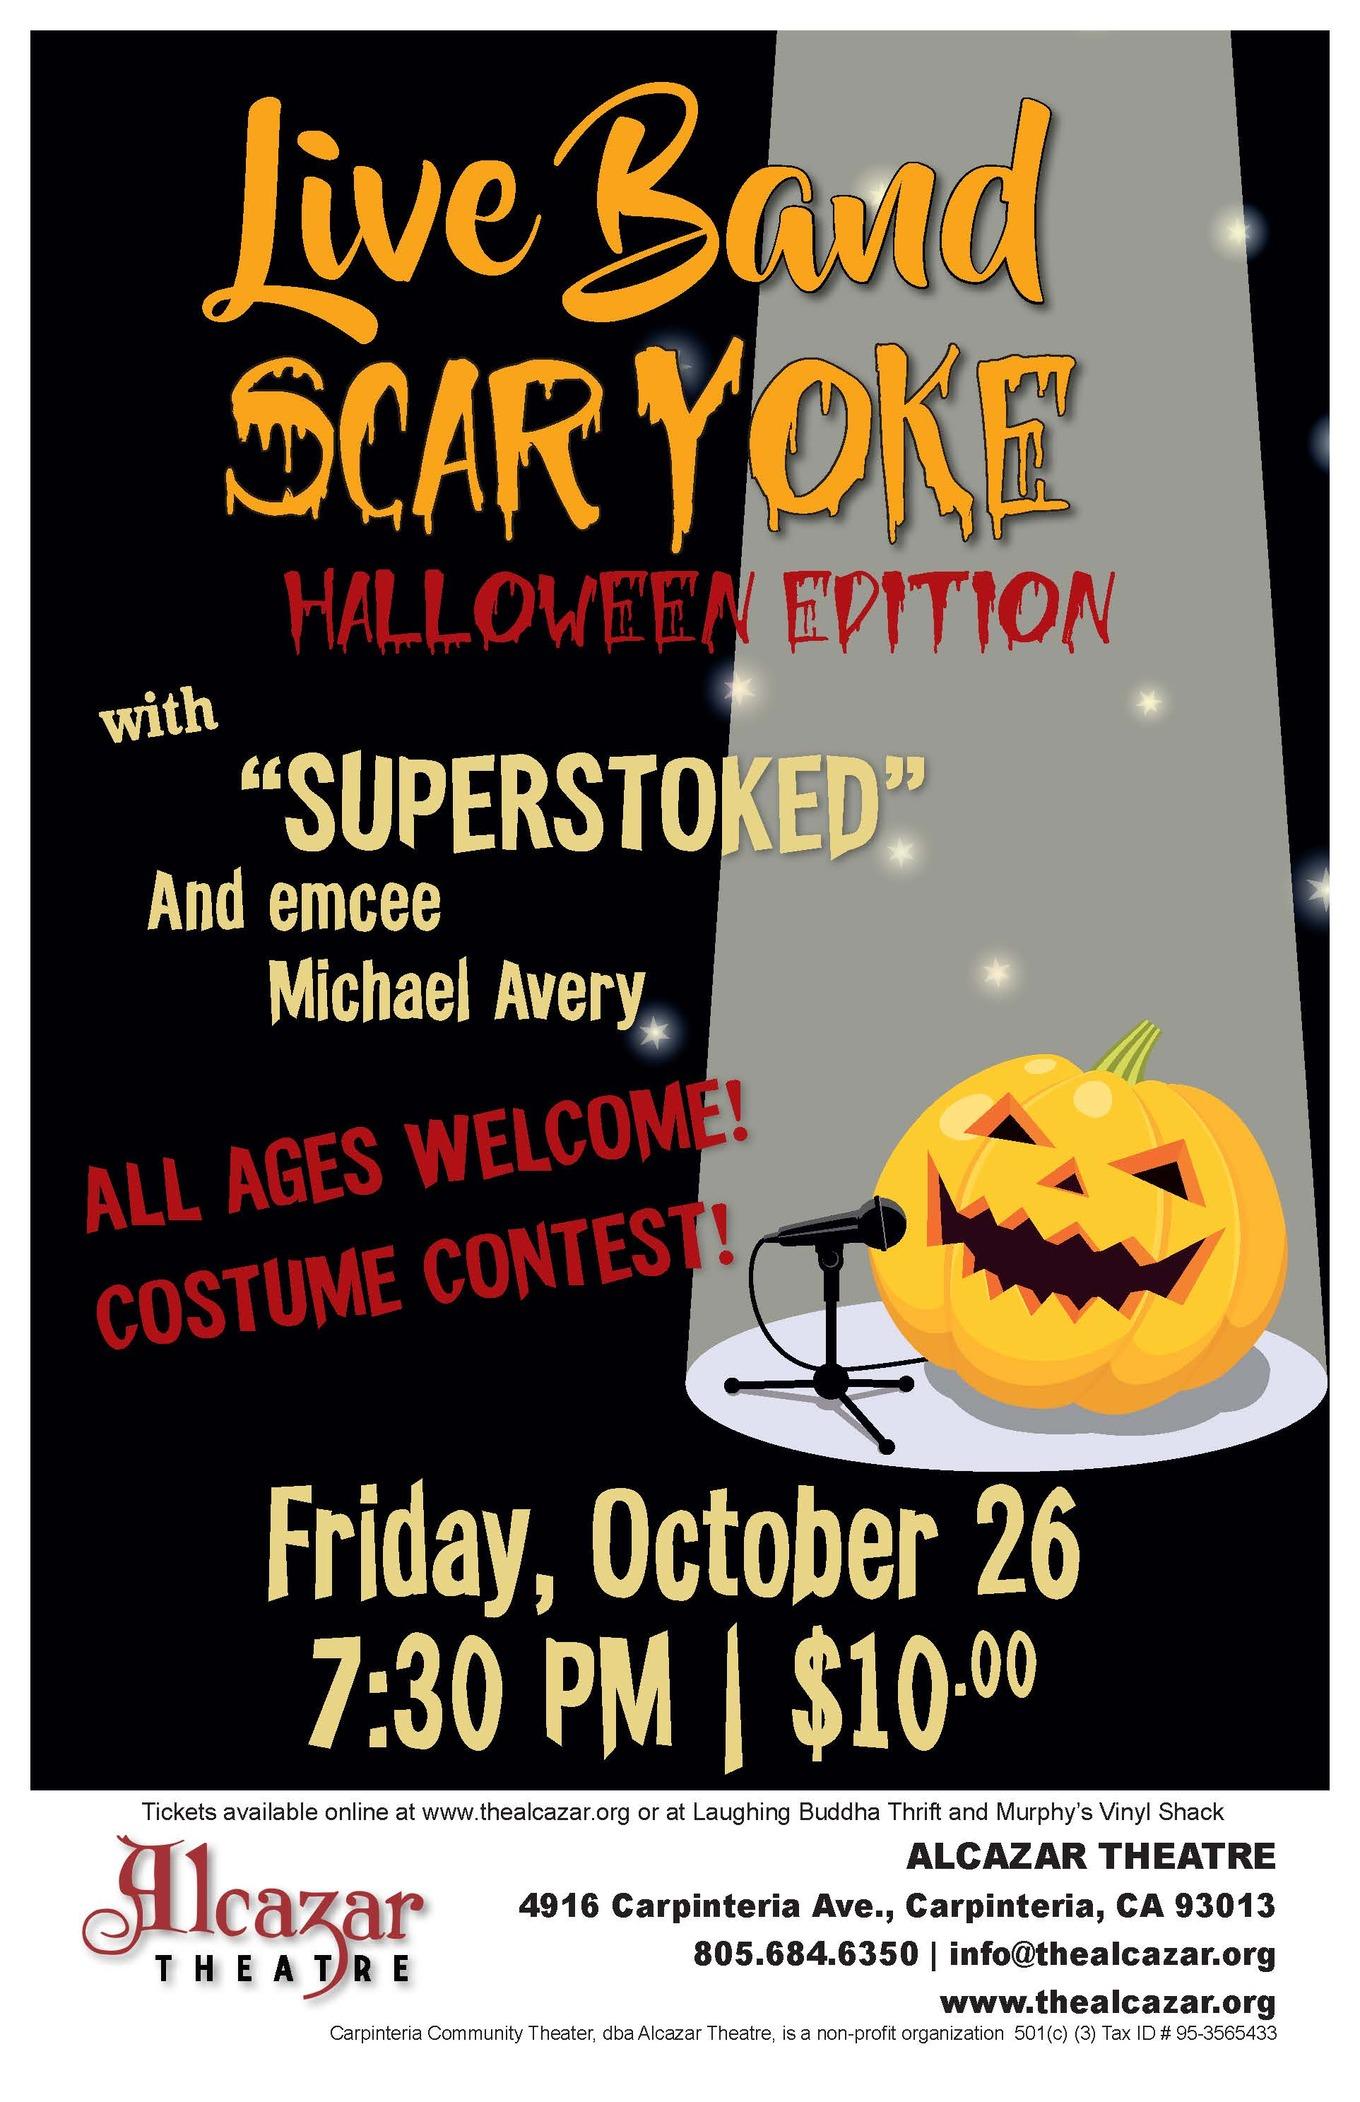 Live Band Scaryoke - Tickets - Alcazar Theatre, Carpinteria